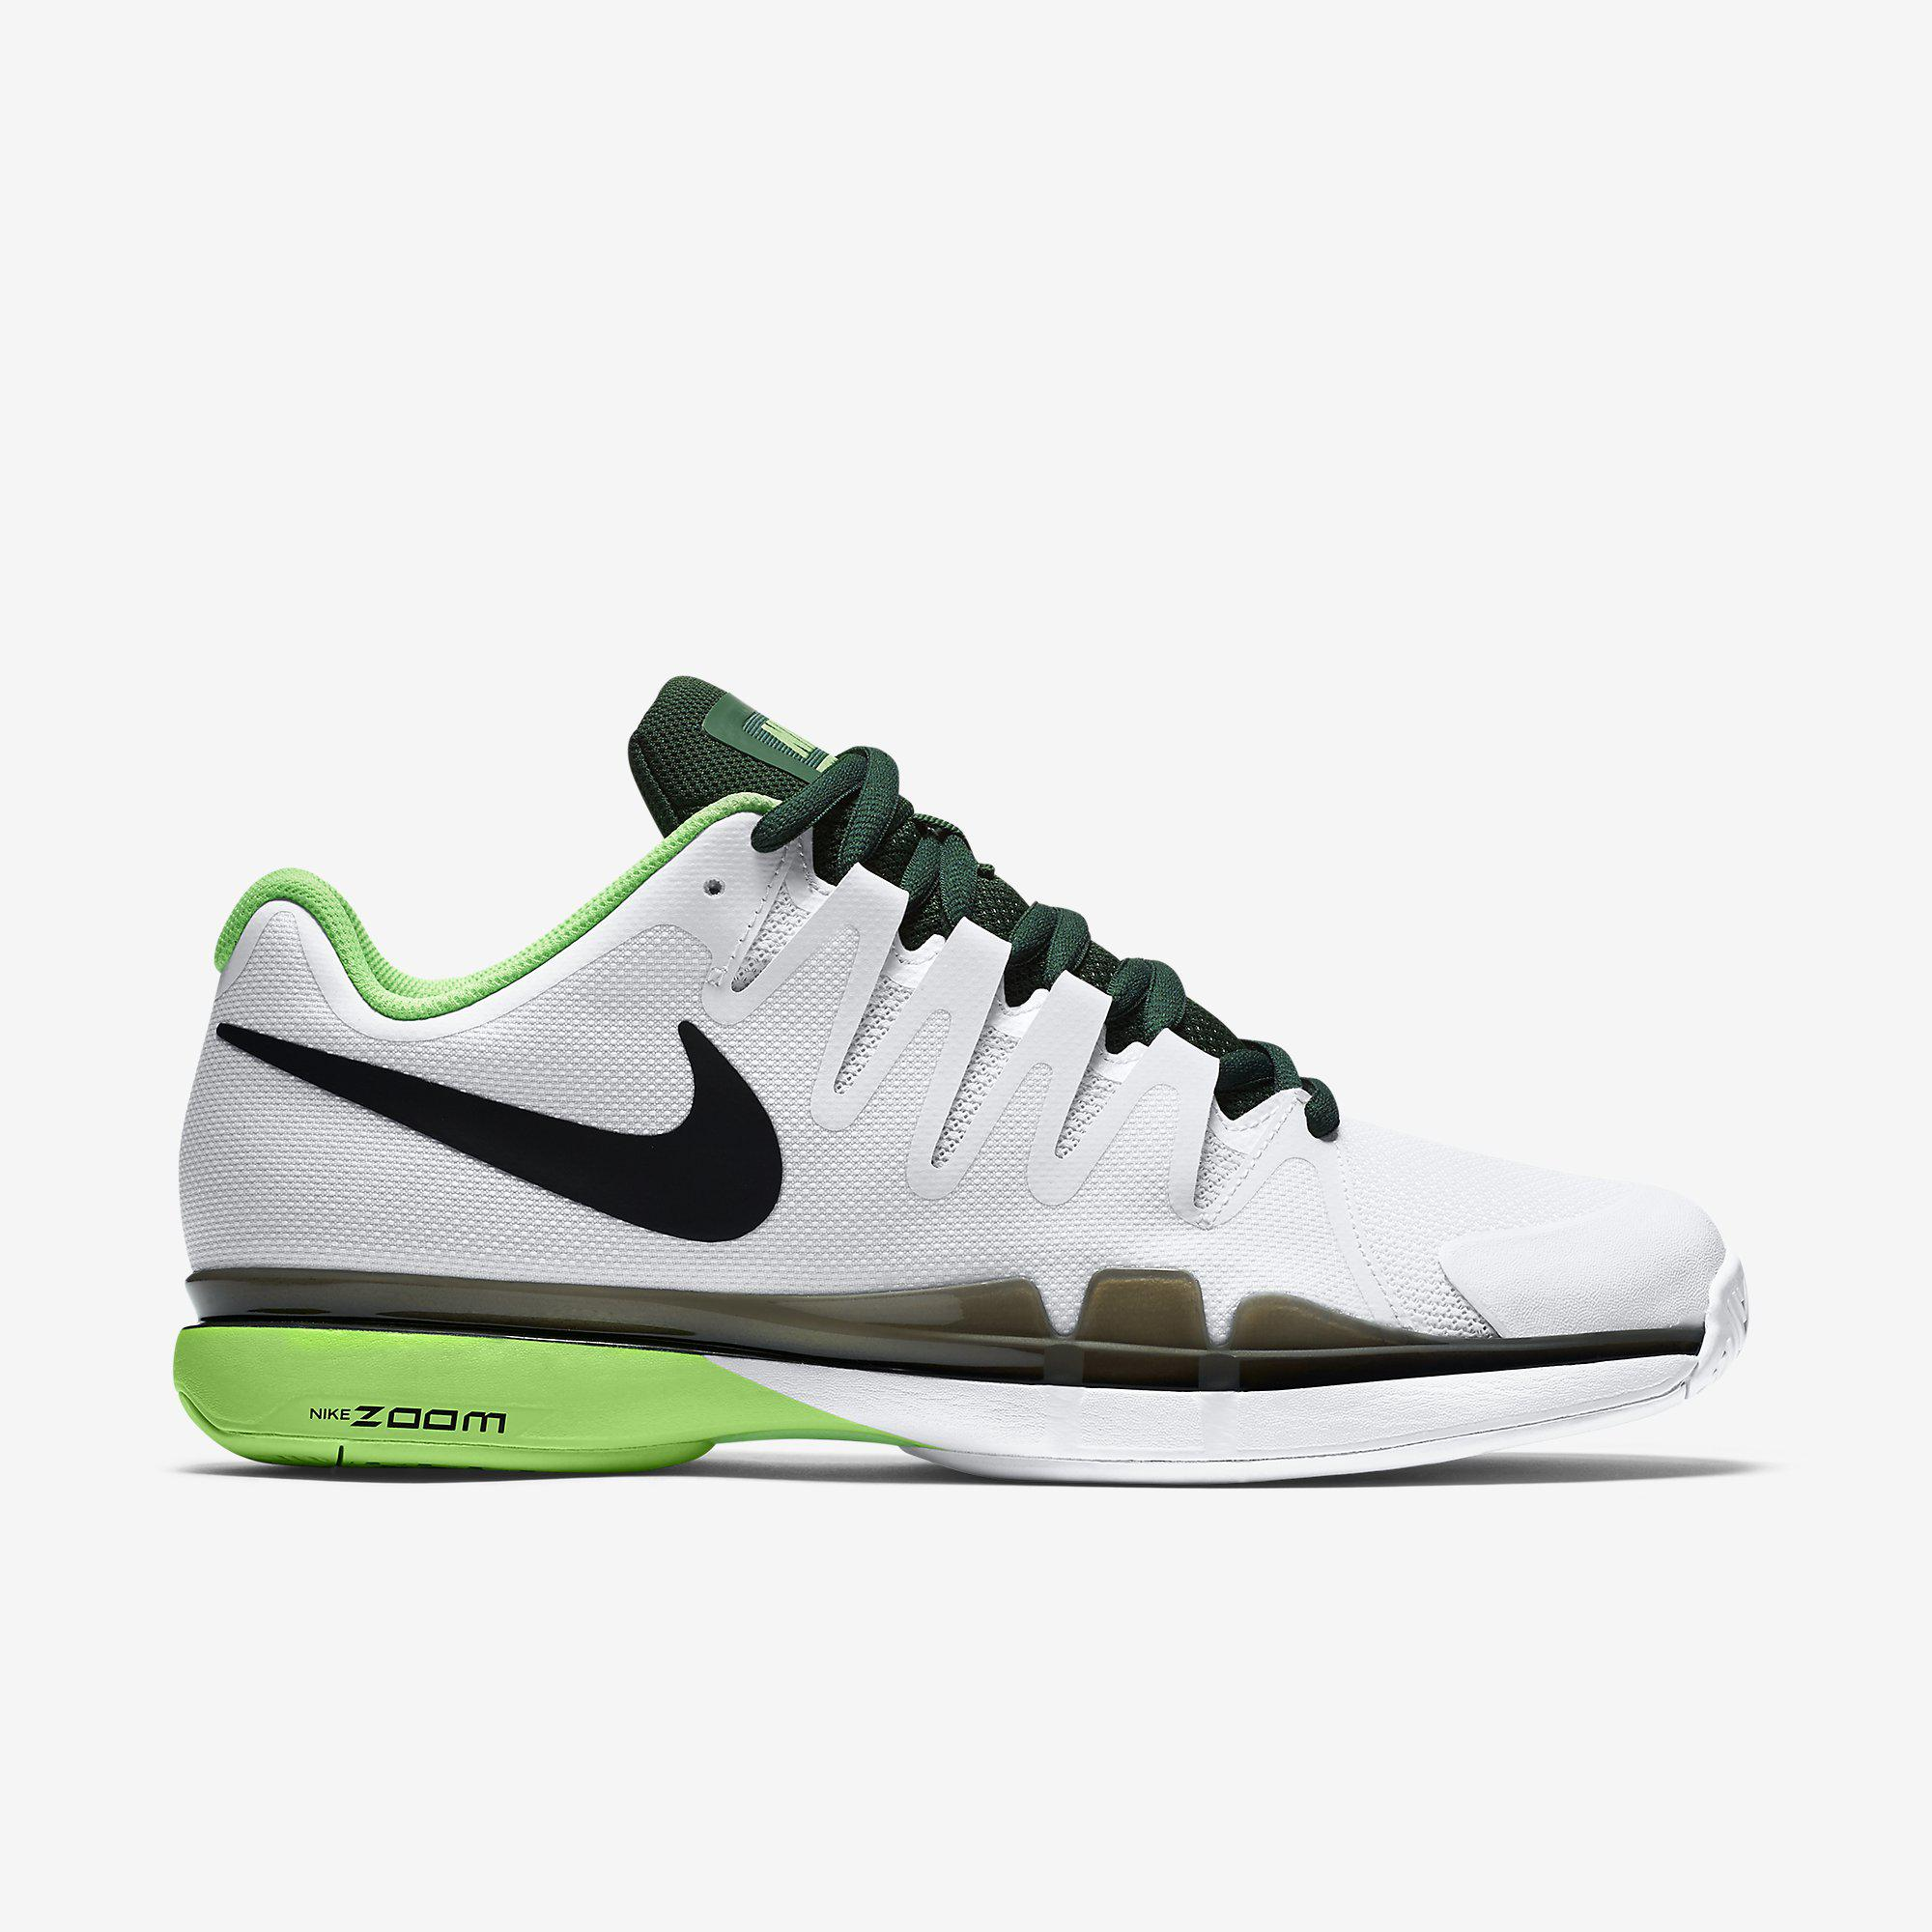 Nike Mens Zoom Vapor 9.5 Tour Tennis Shoes - White/Black/Green